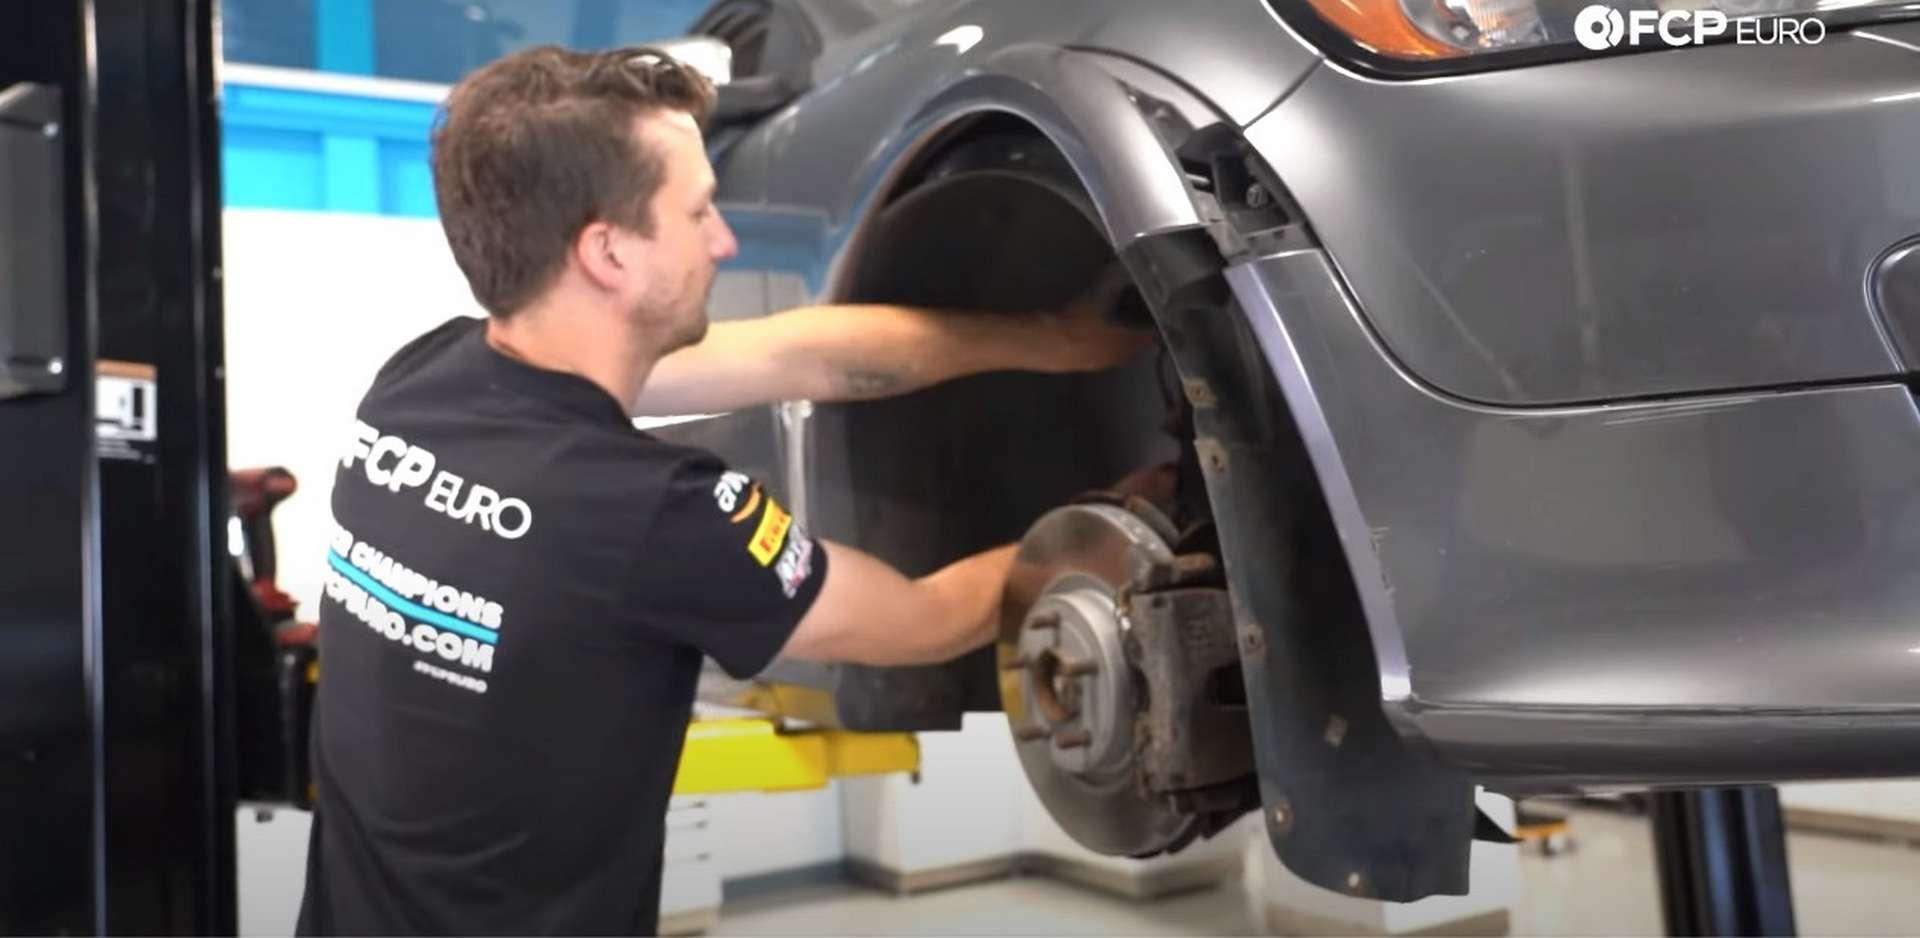 DIY Volvo Alternator and Serpentine Belt Replacement removing the fender liner